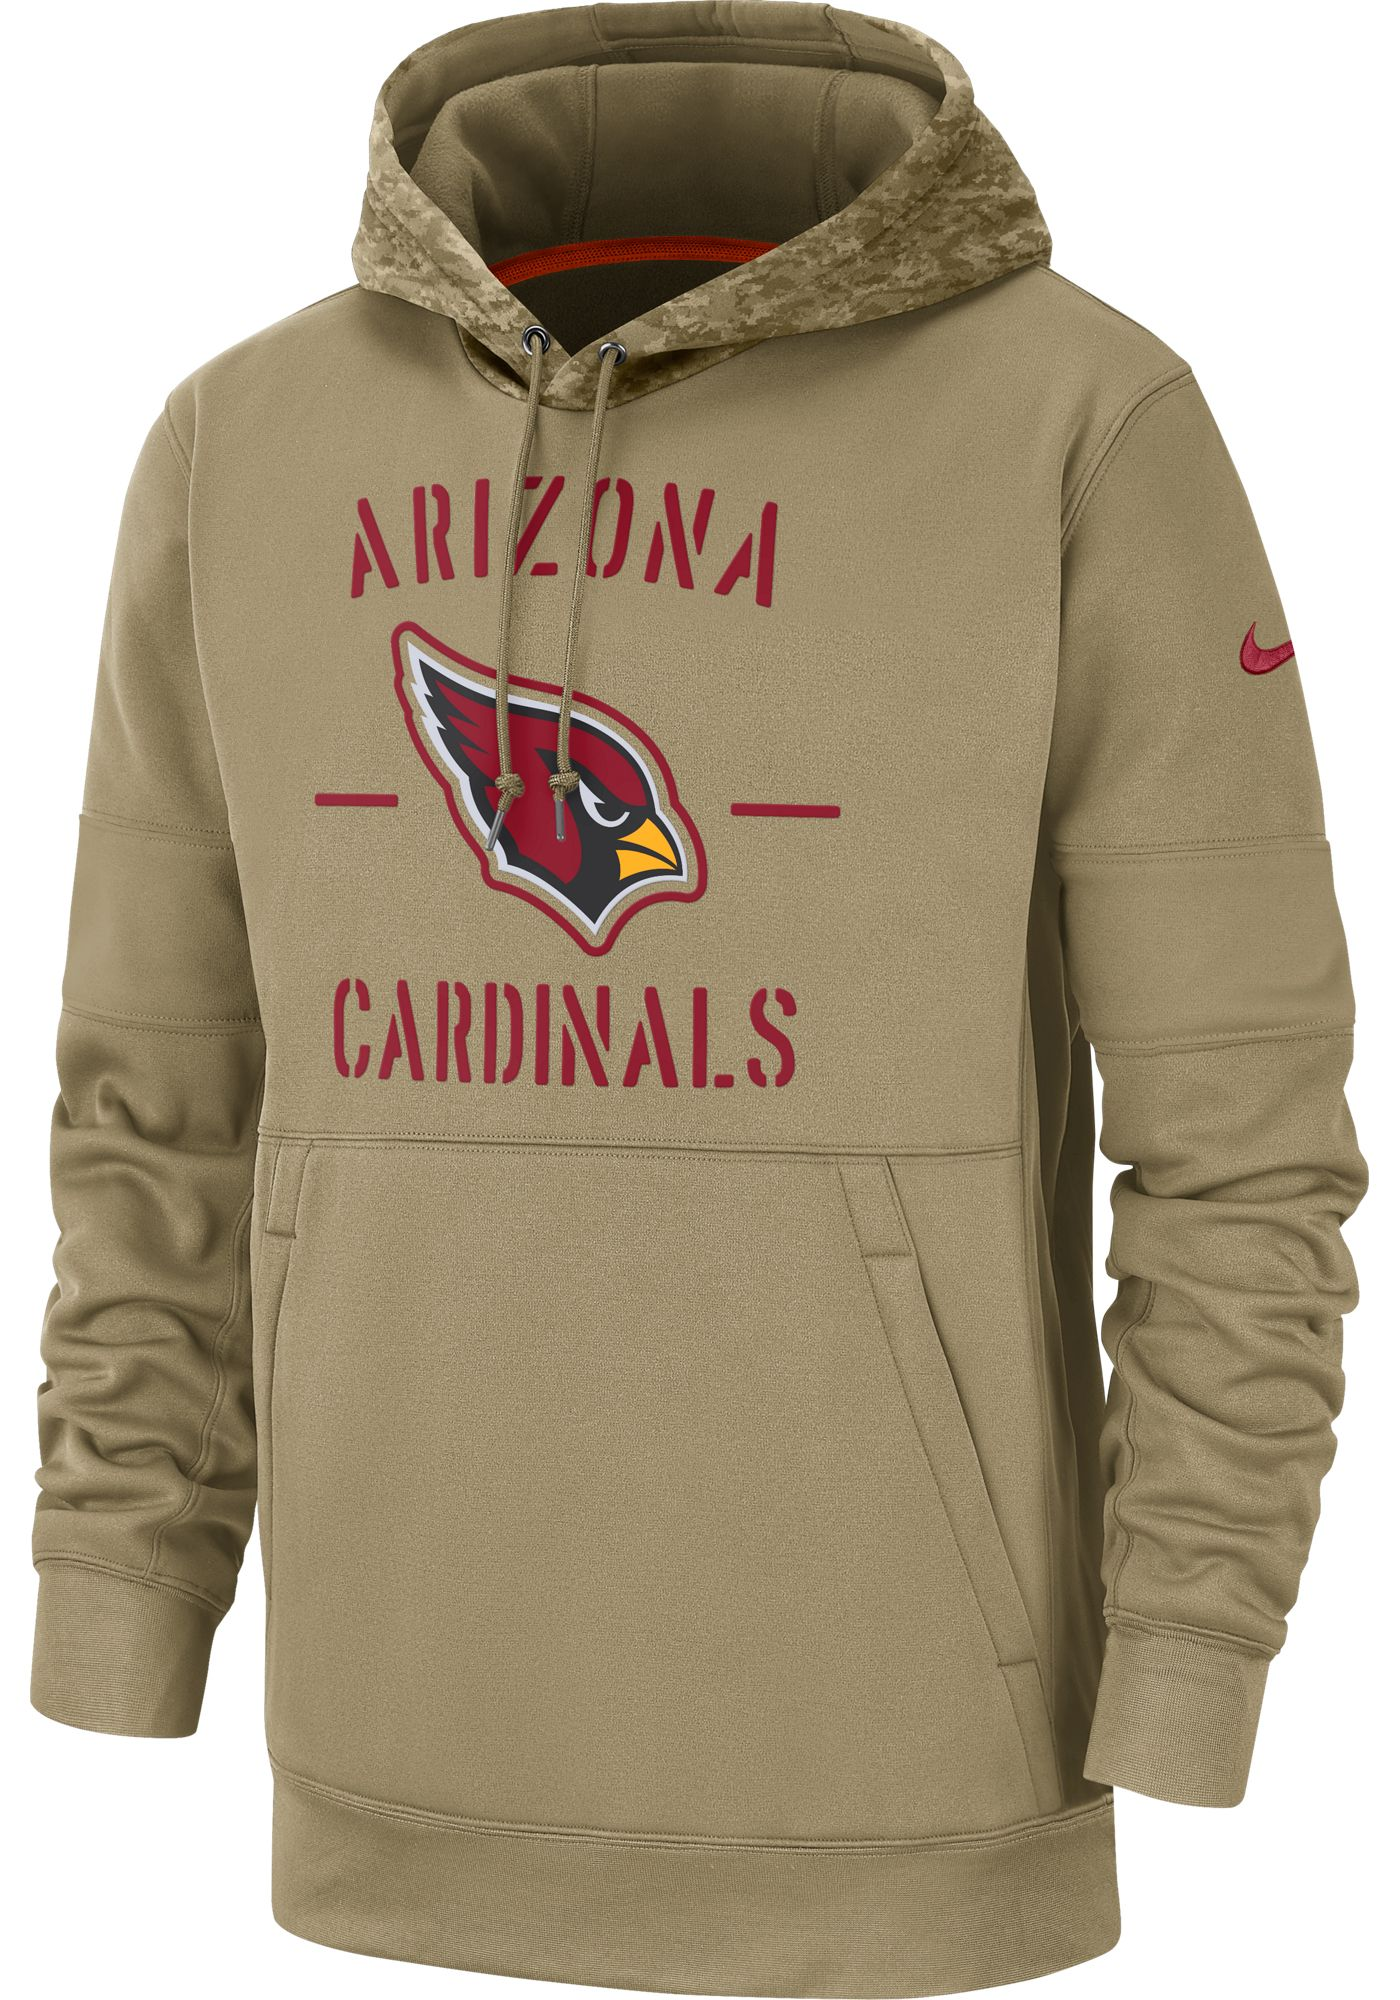 Nike Men's Salute to Service Arizona Cardinals Therma-FIT Beige Camo Hoodie